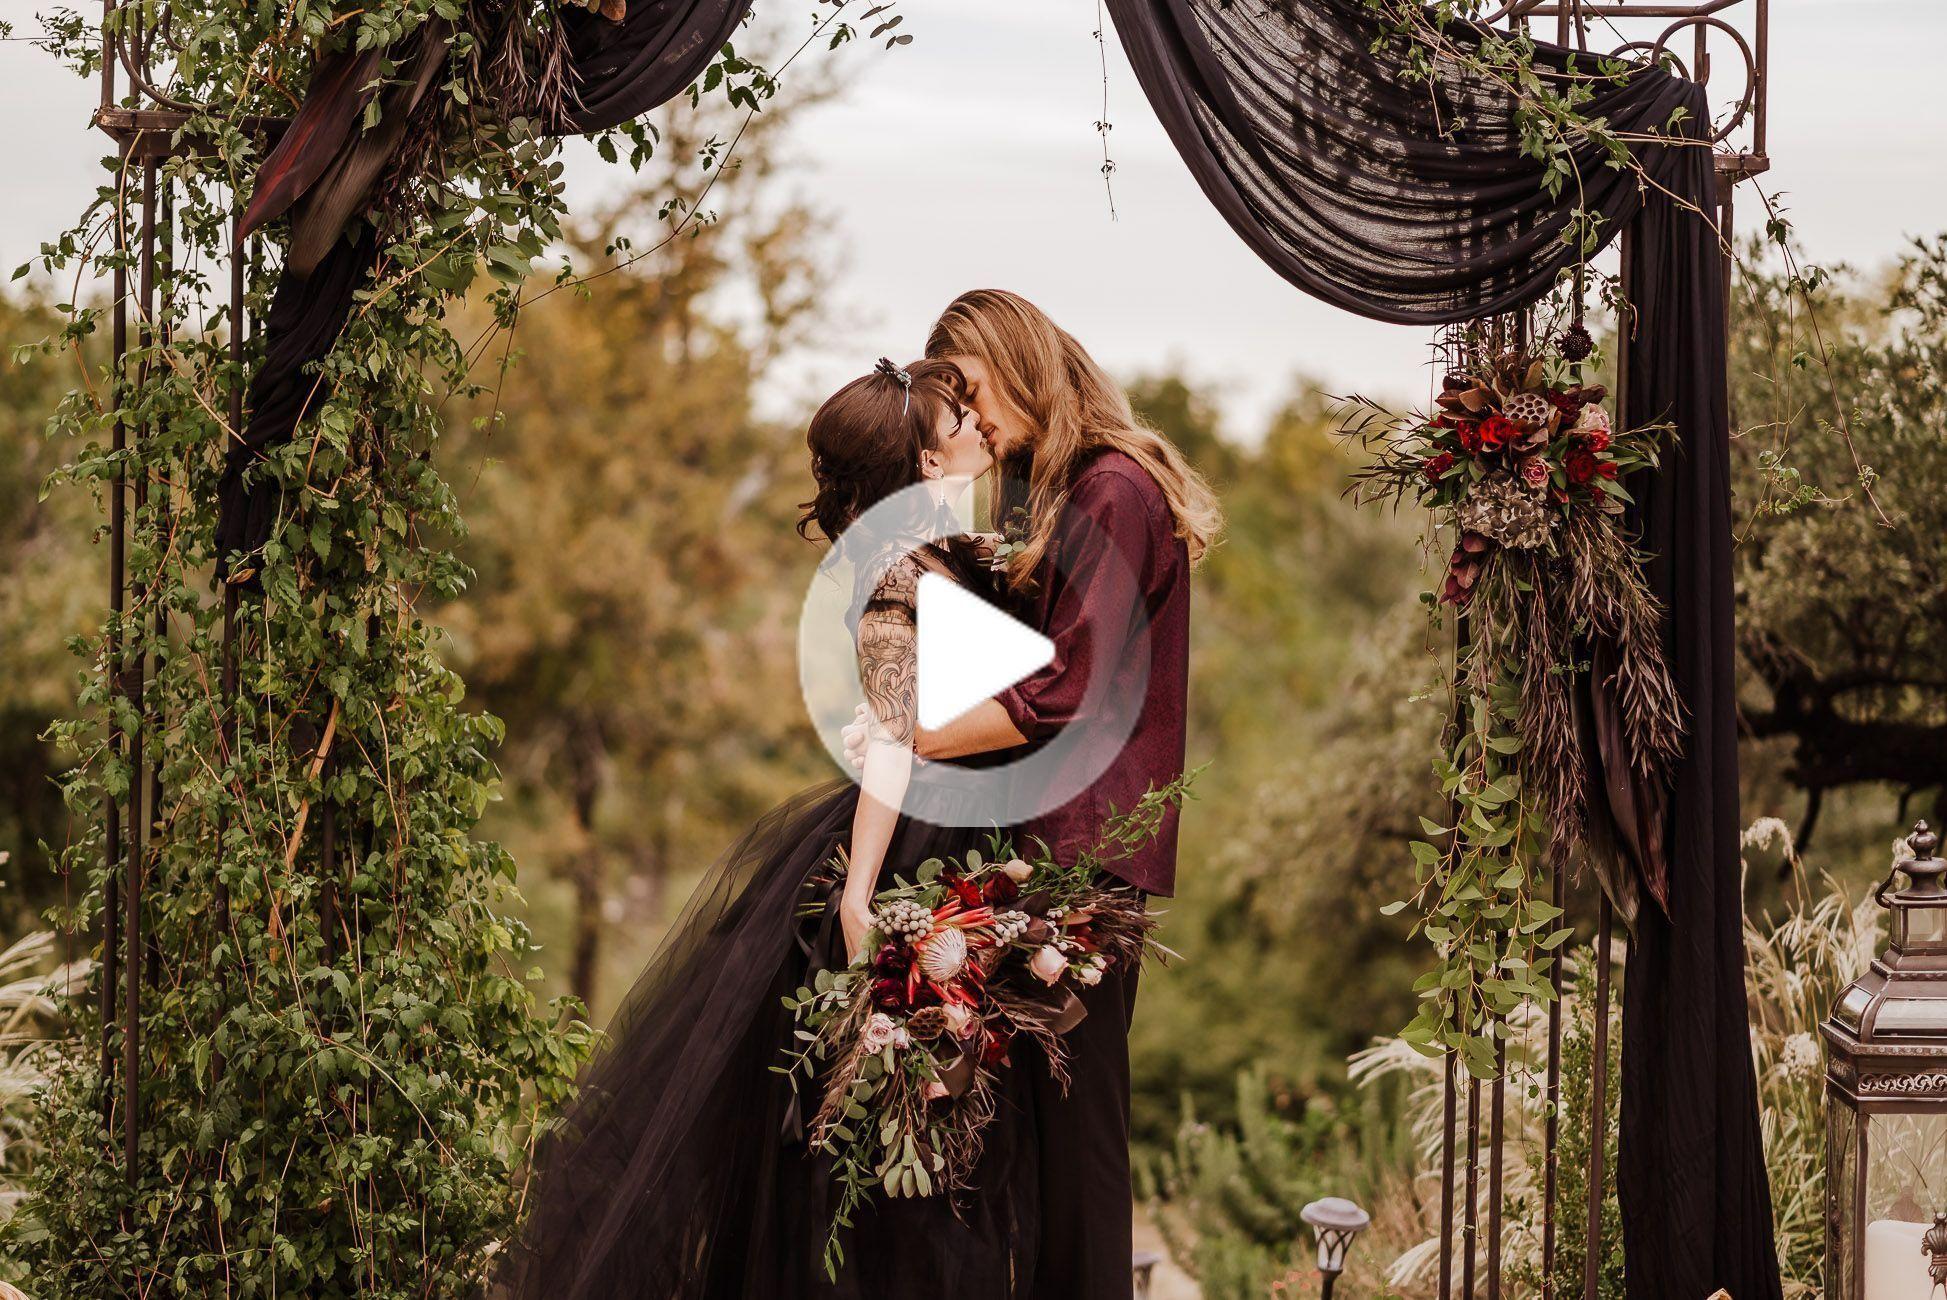 Dfw Halloween 2020 Matrimonio di Halloween | Sede dei giardini nascosti in 2020 | Dfw